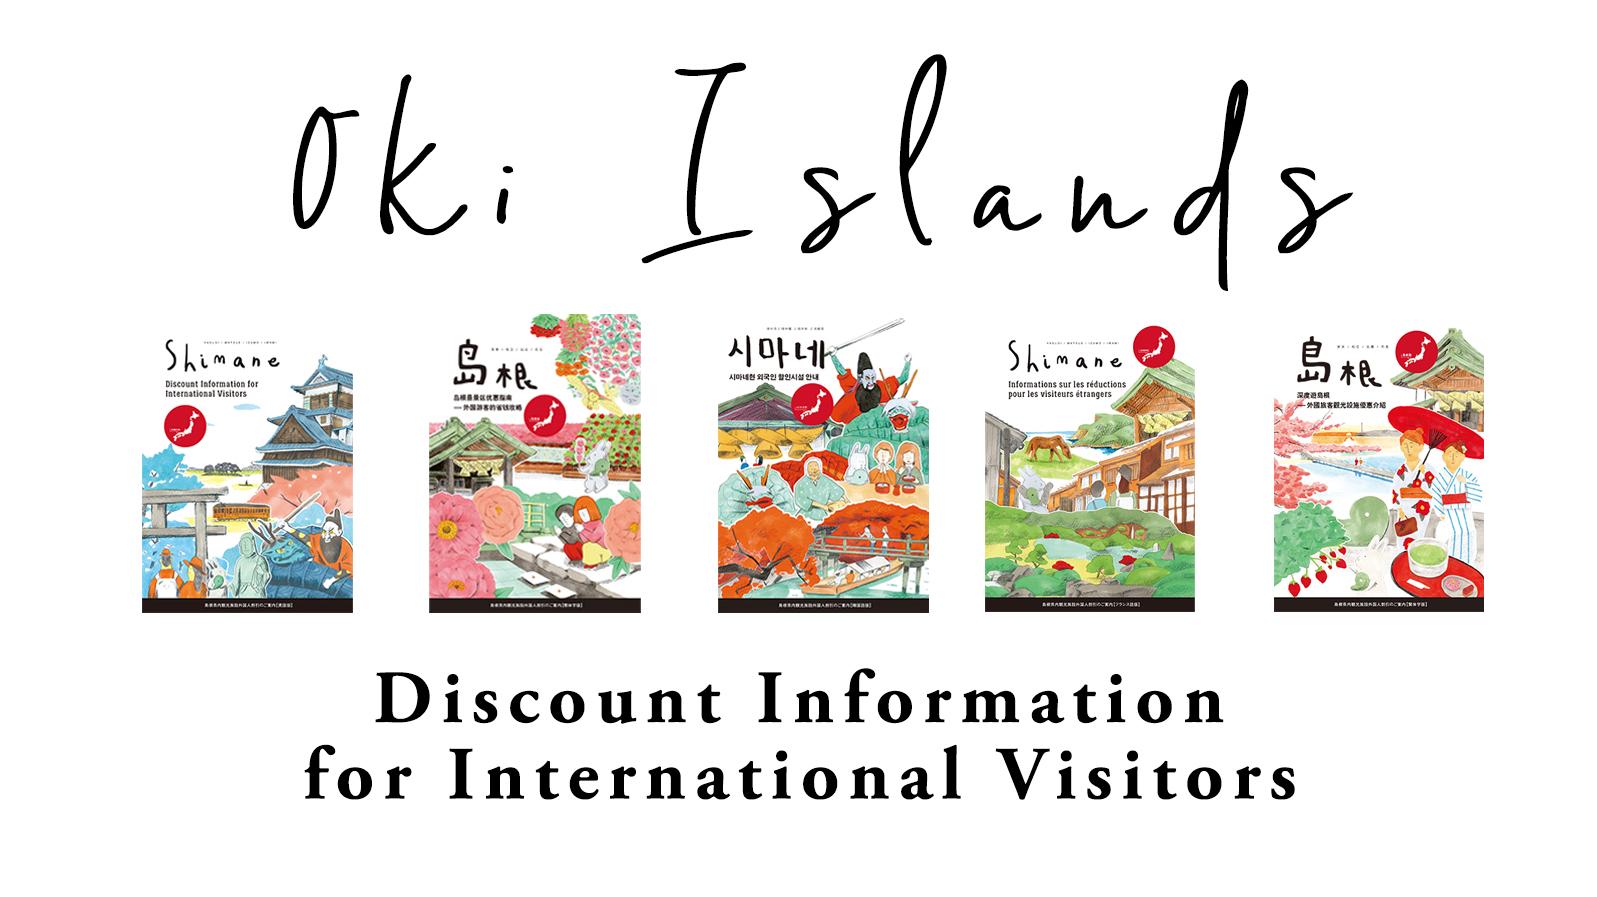 Shimane Discount Information Oki Islands